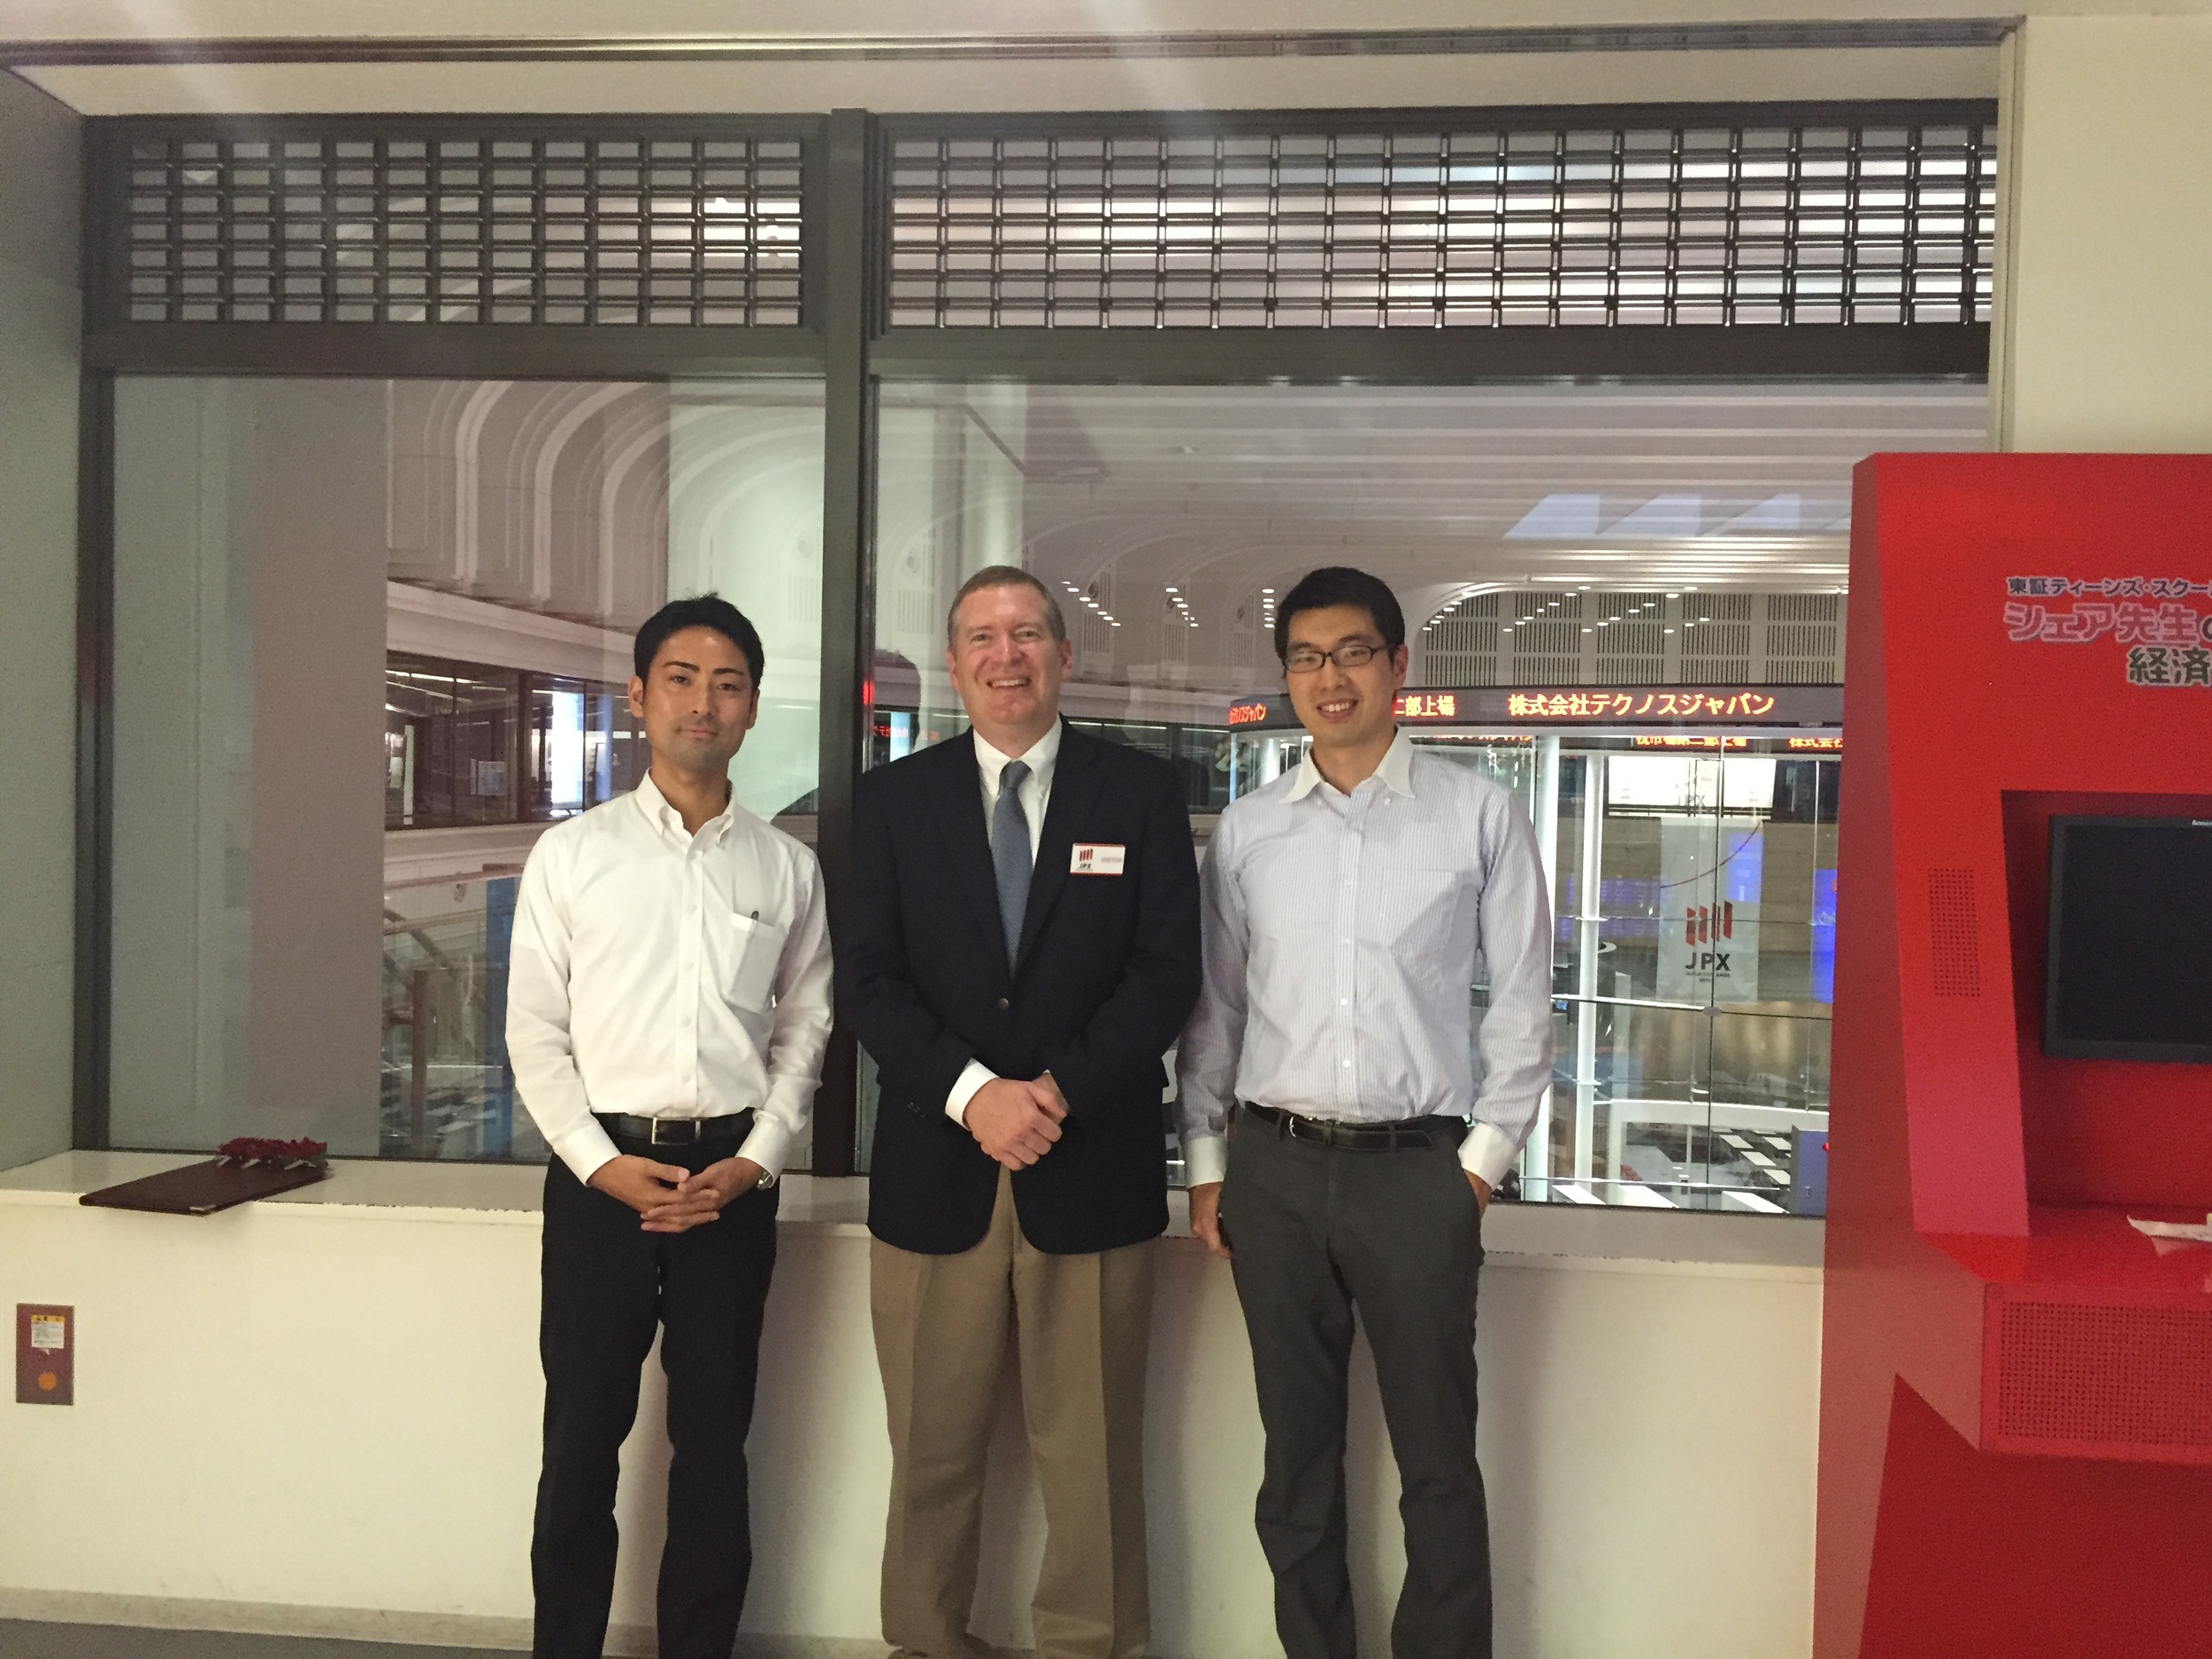 TSE - John with Shun Takato (left) and Goki Sakaguchi (right).JPG